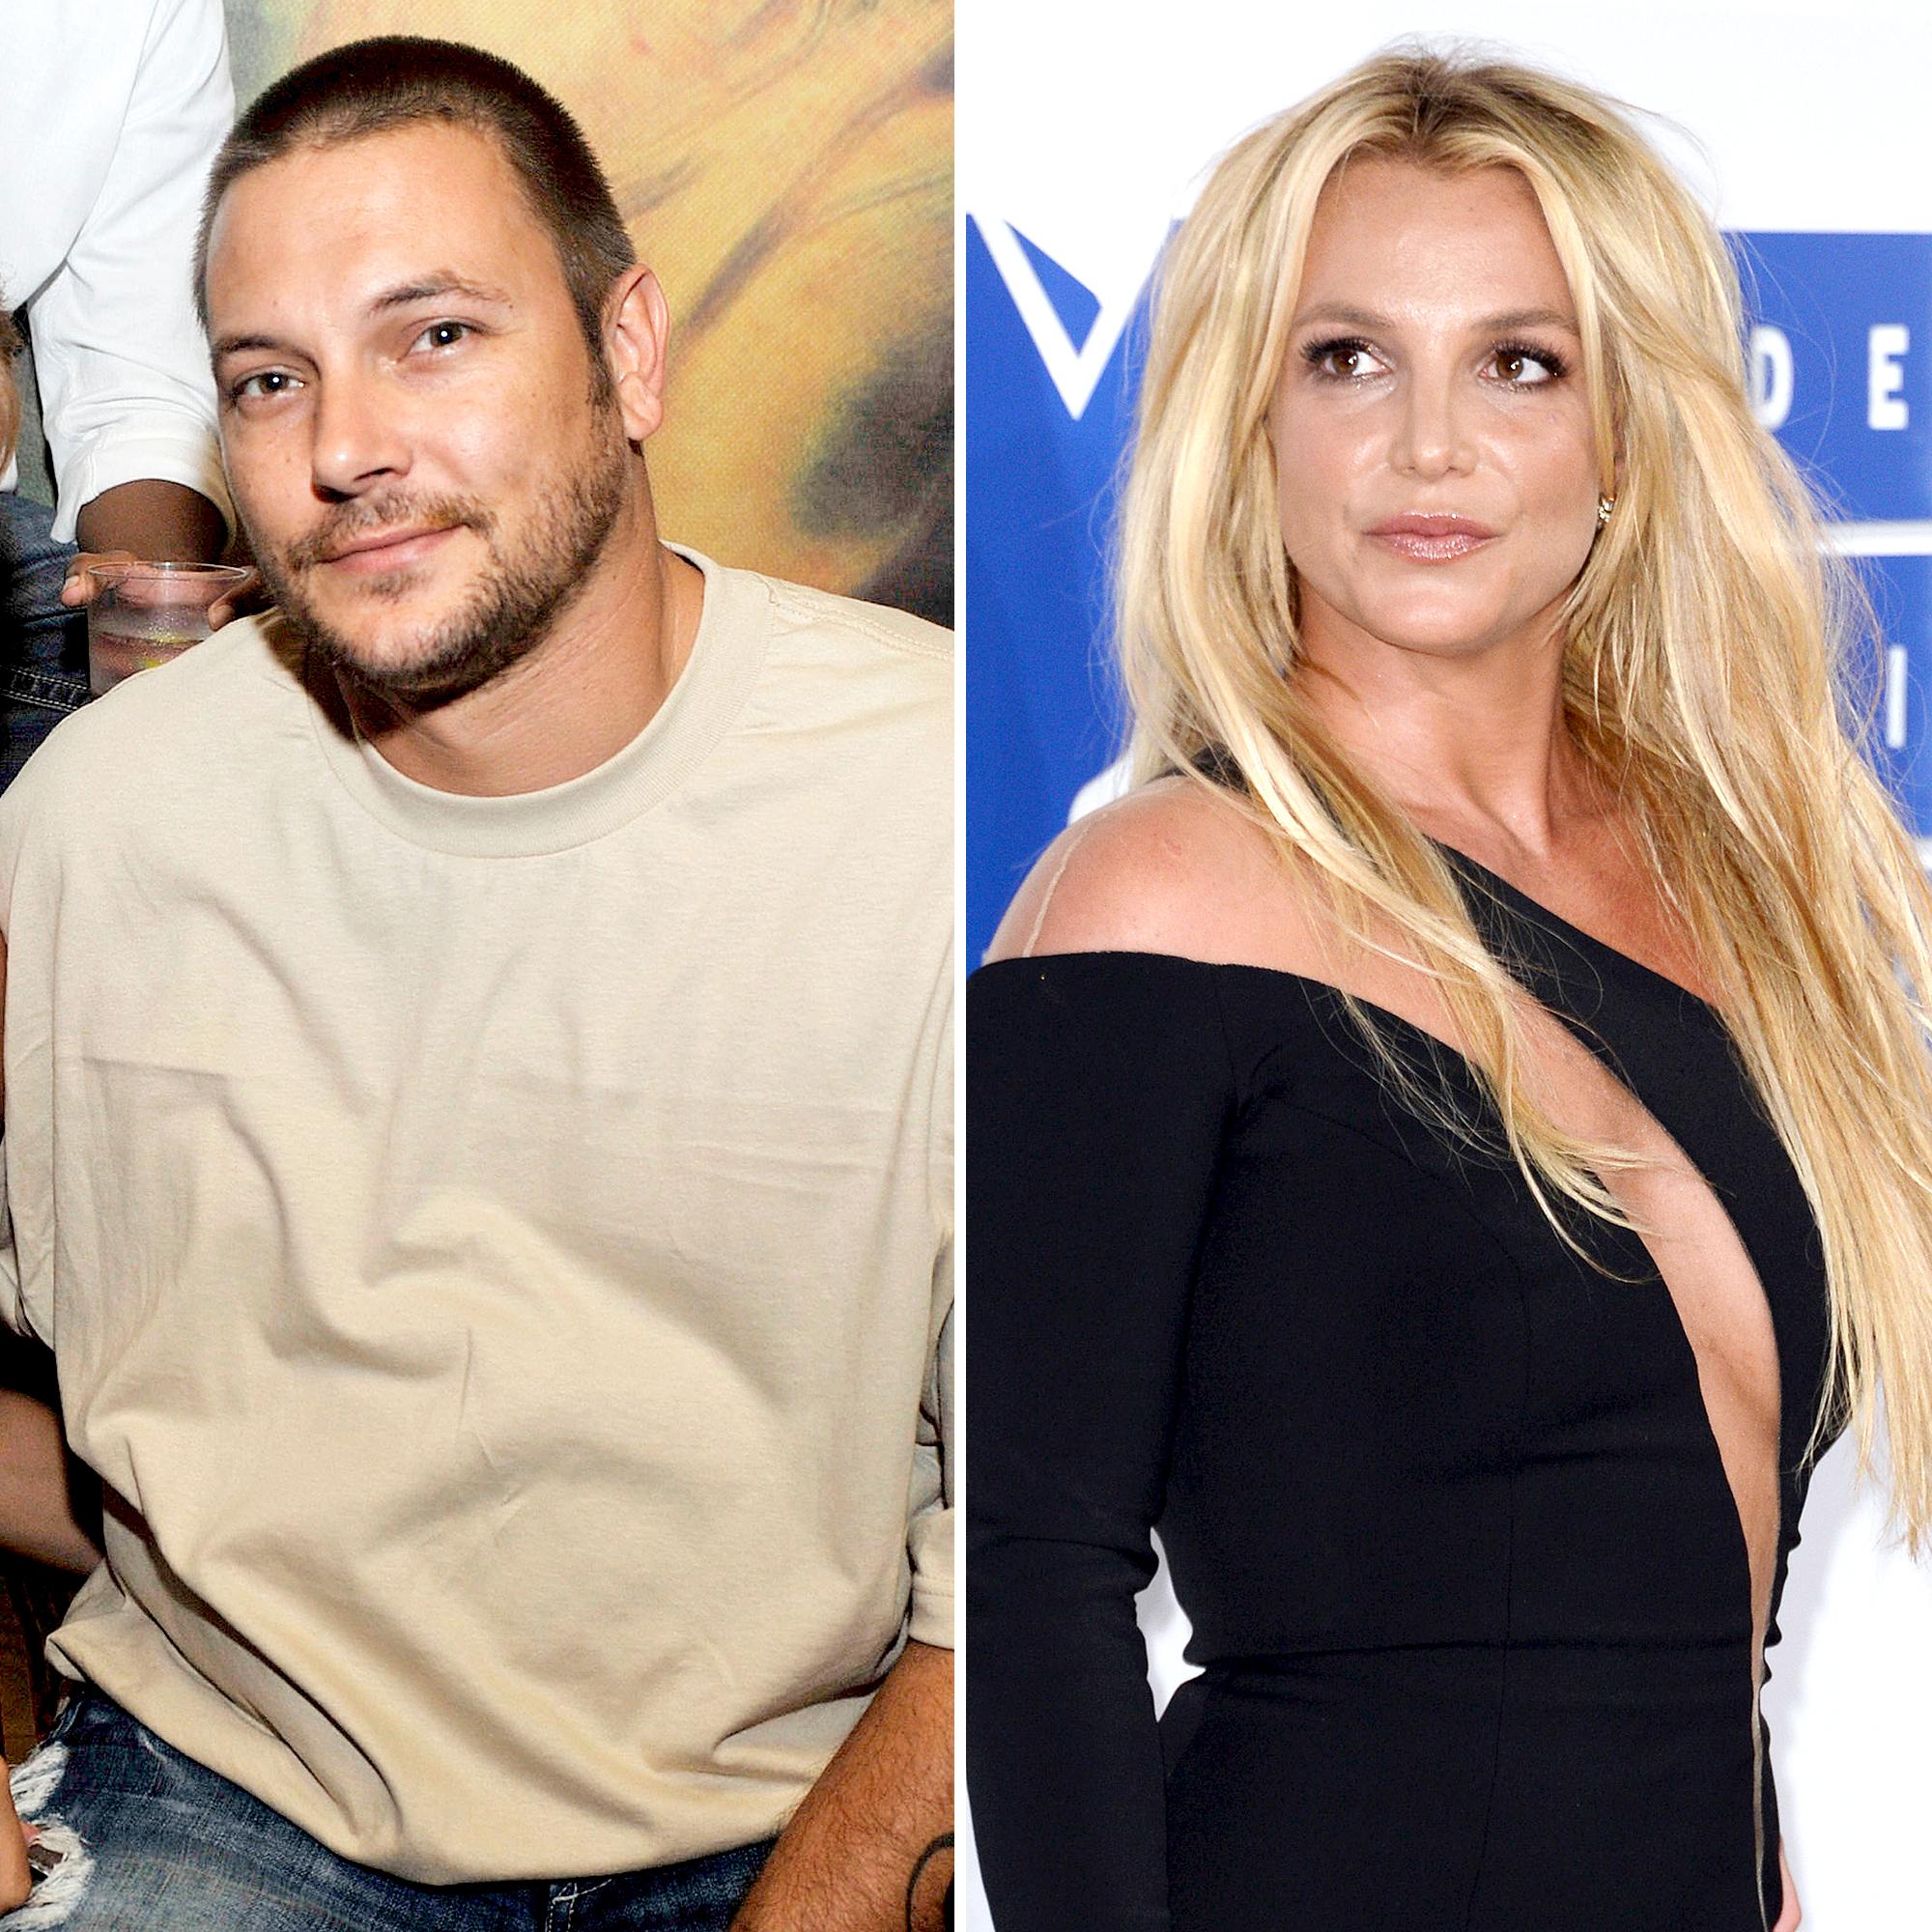 Kevin-Federline-Is-'Handling'-Son's-Shocking-Britney-Spears-Comments